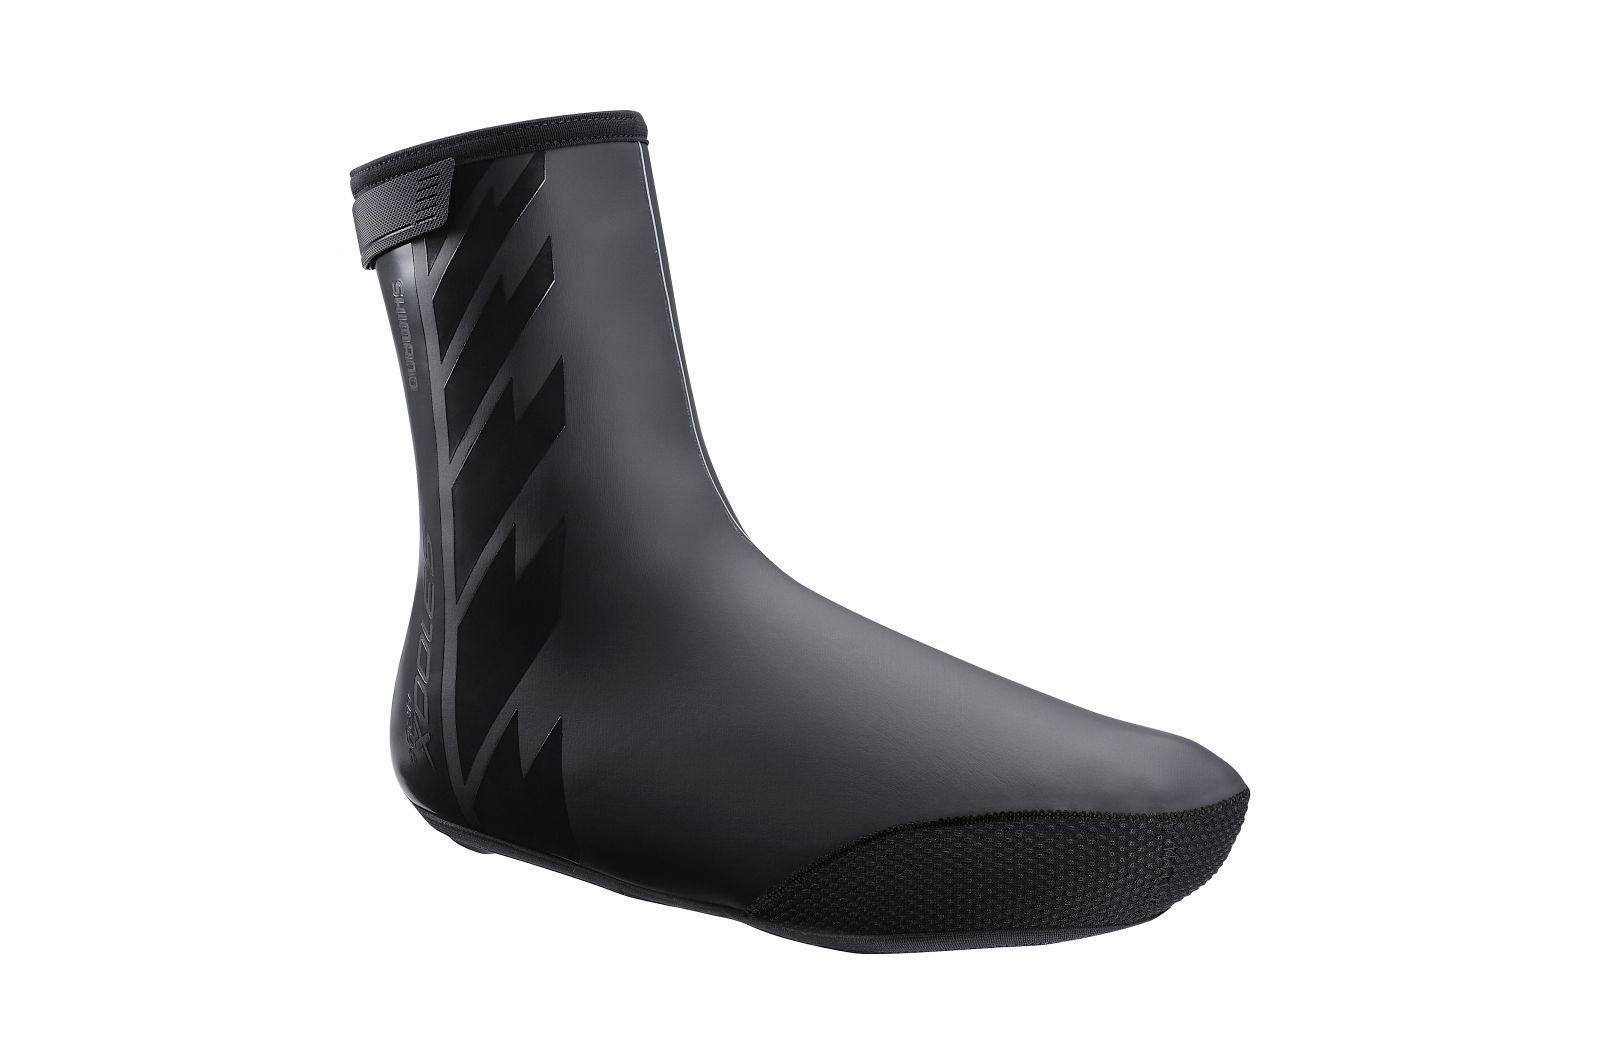 SHIMANO S3100X NPU+ návleky na obuv, černá, XL